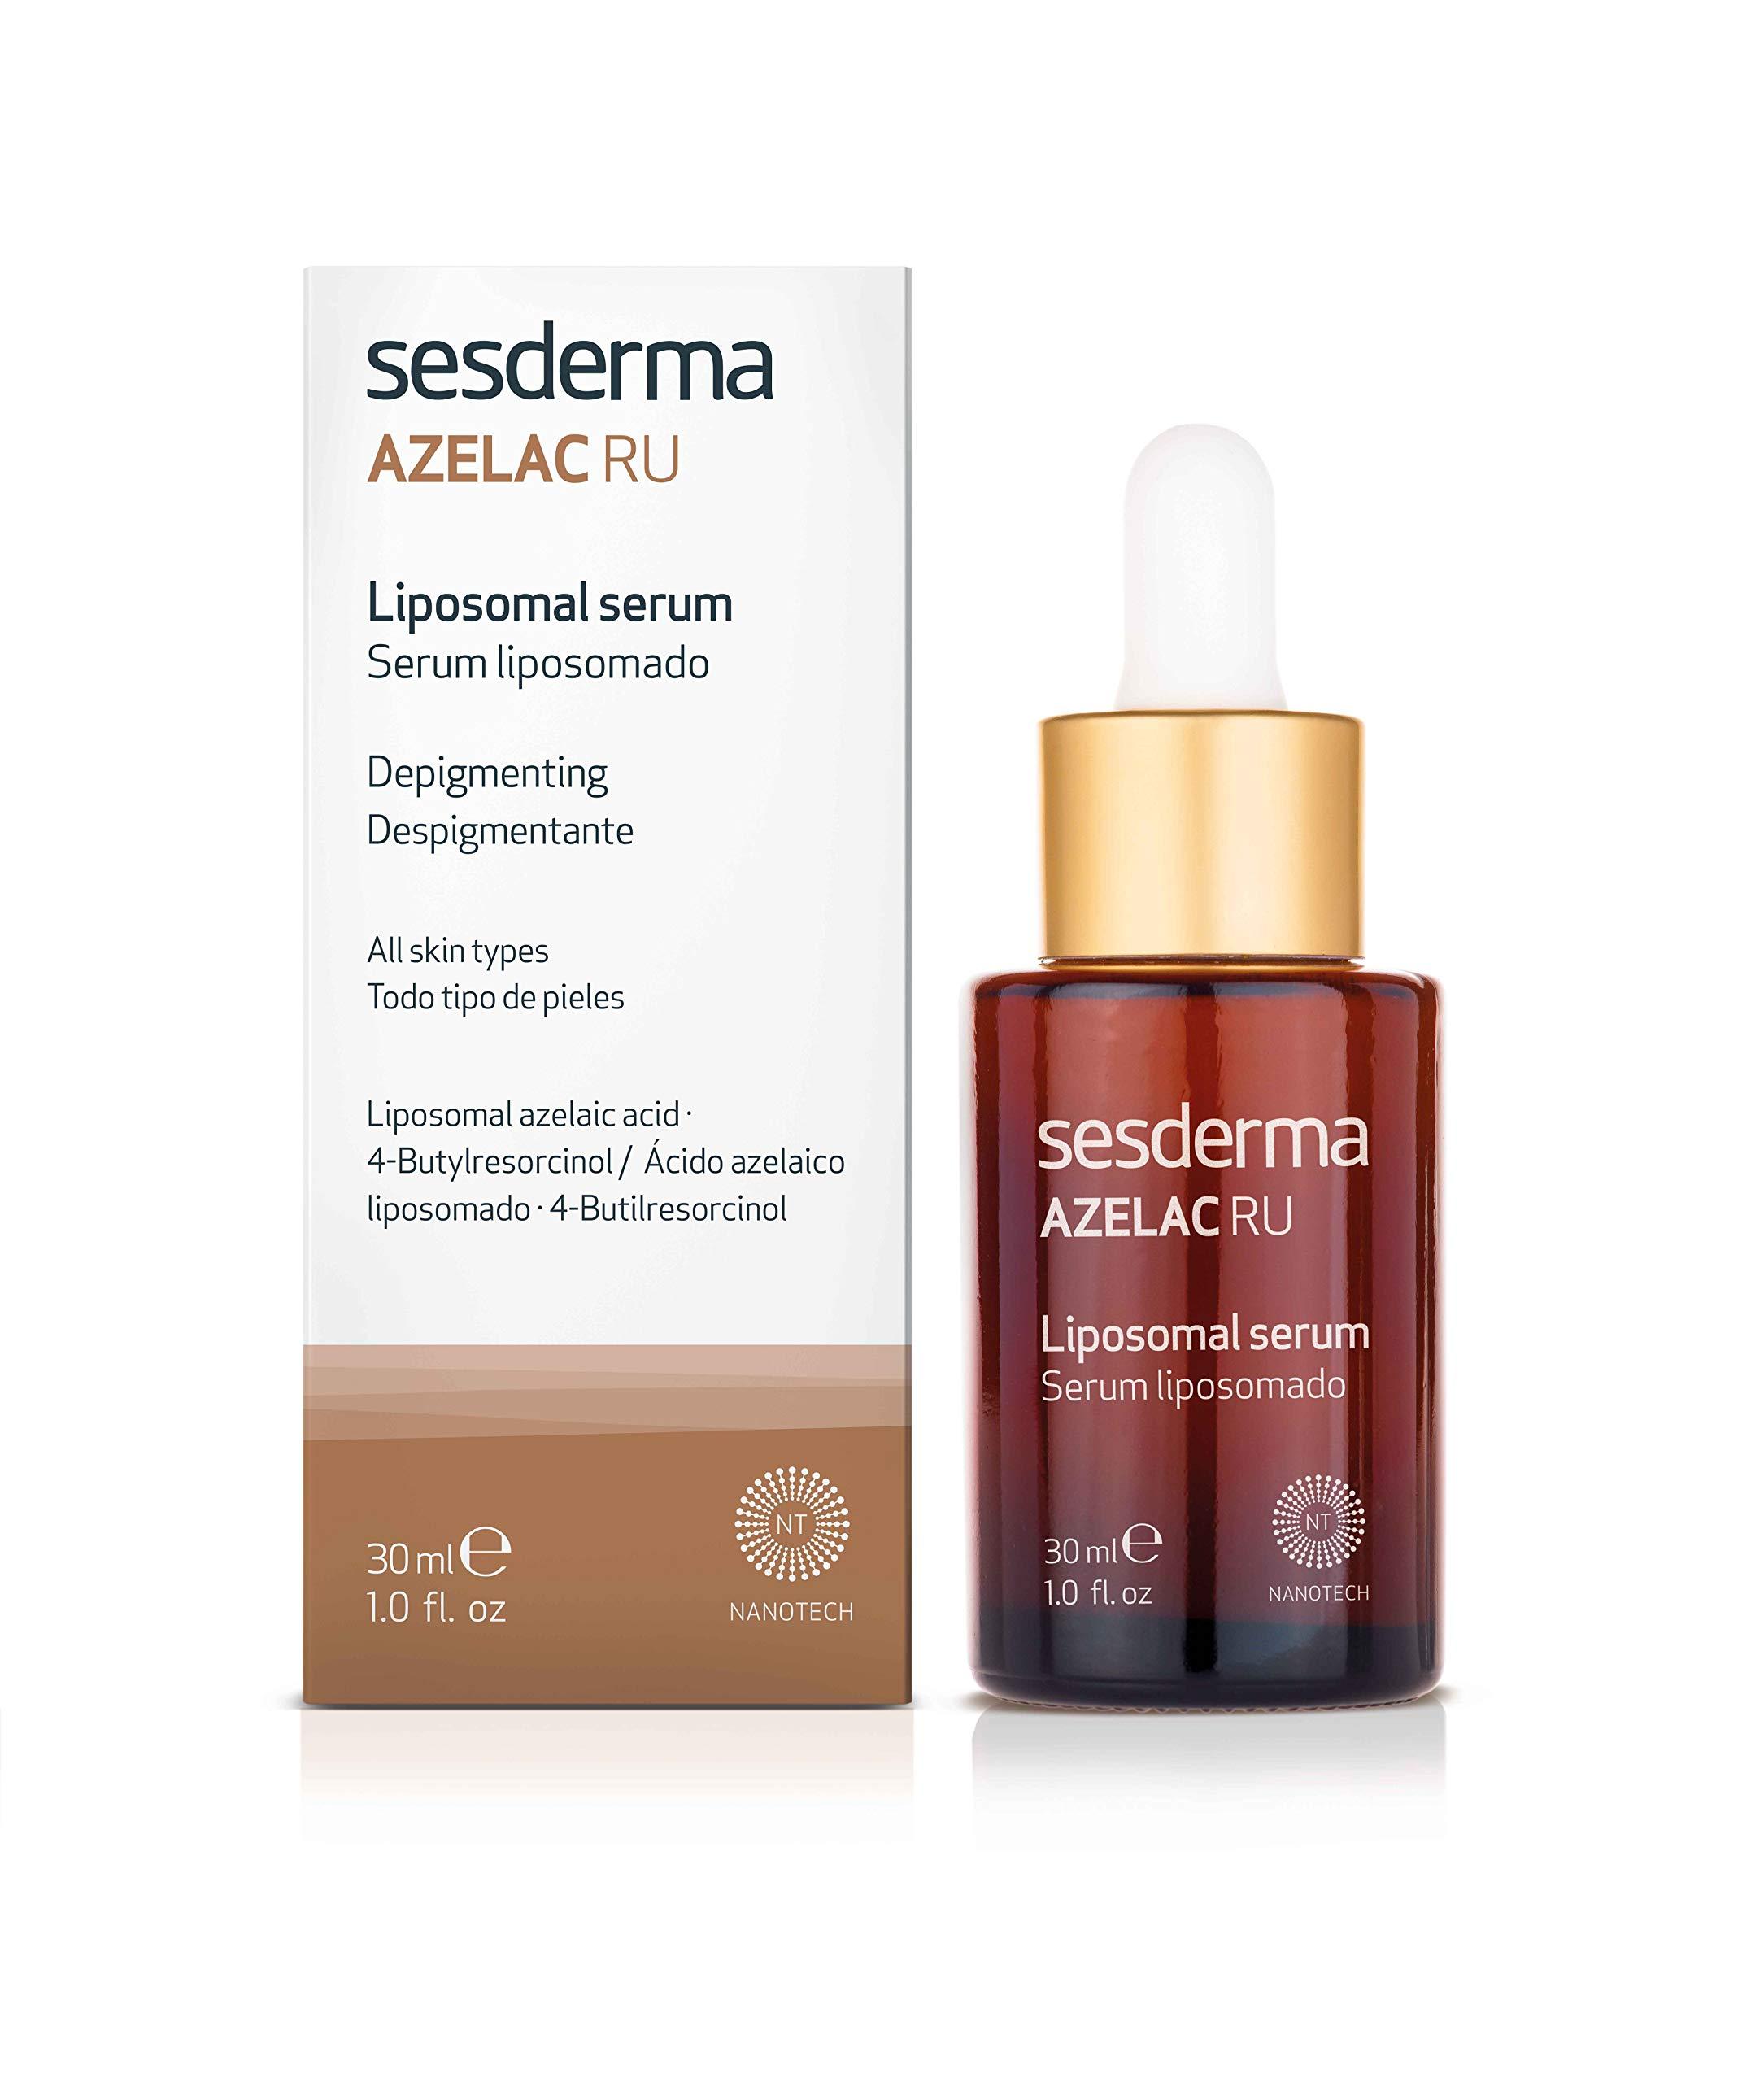 Sesderma Azelac Ru Liposomal serum - 30ml